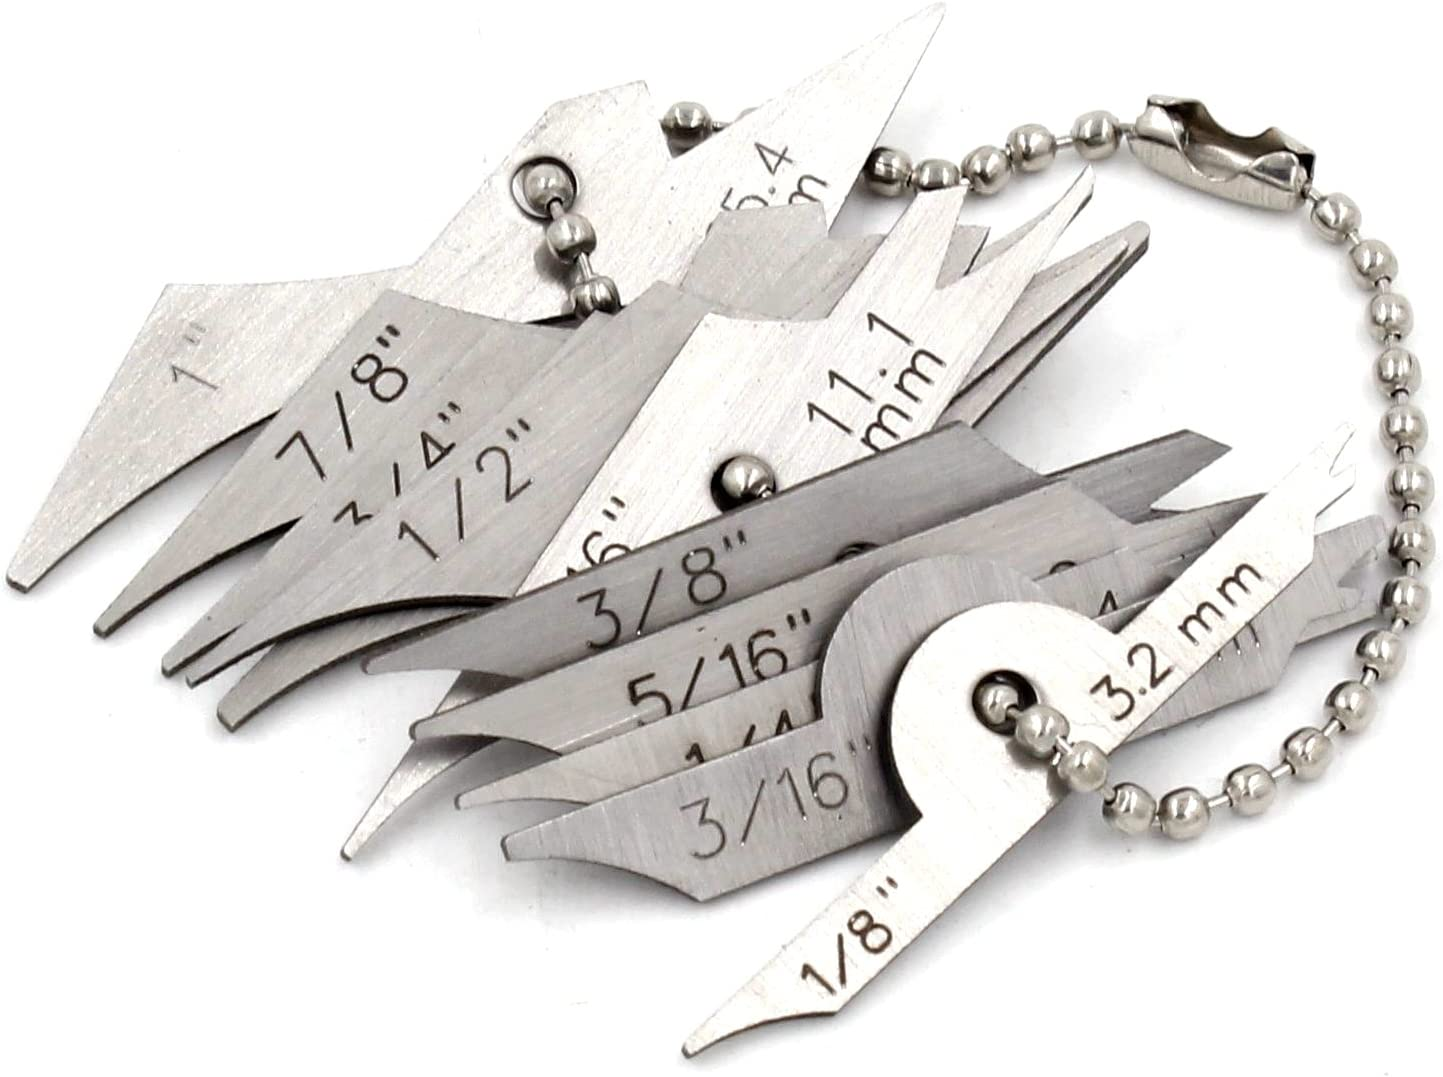 Mini Fillet Weld Keys Inspection Gauge Welding Radius Gage 10pcs Chain Set Amazon Ca Tools Home Improvement